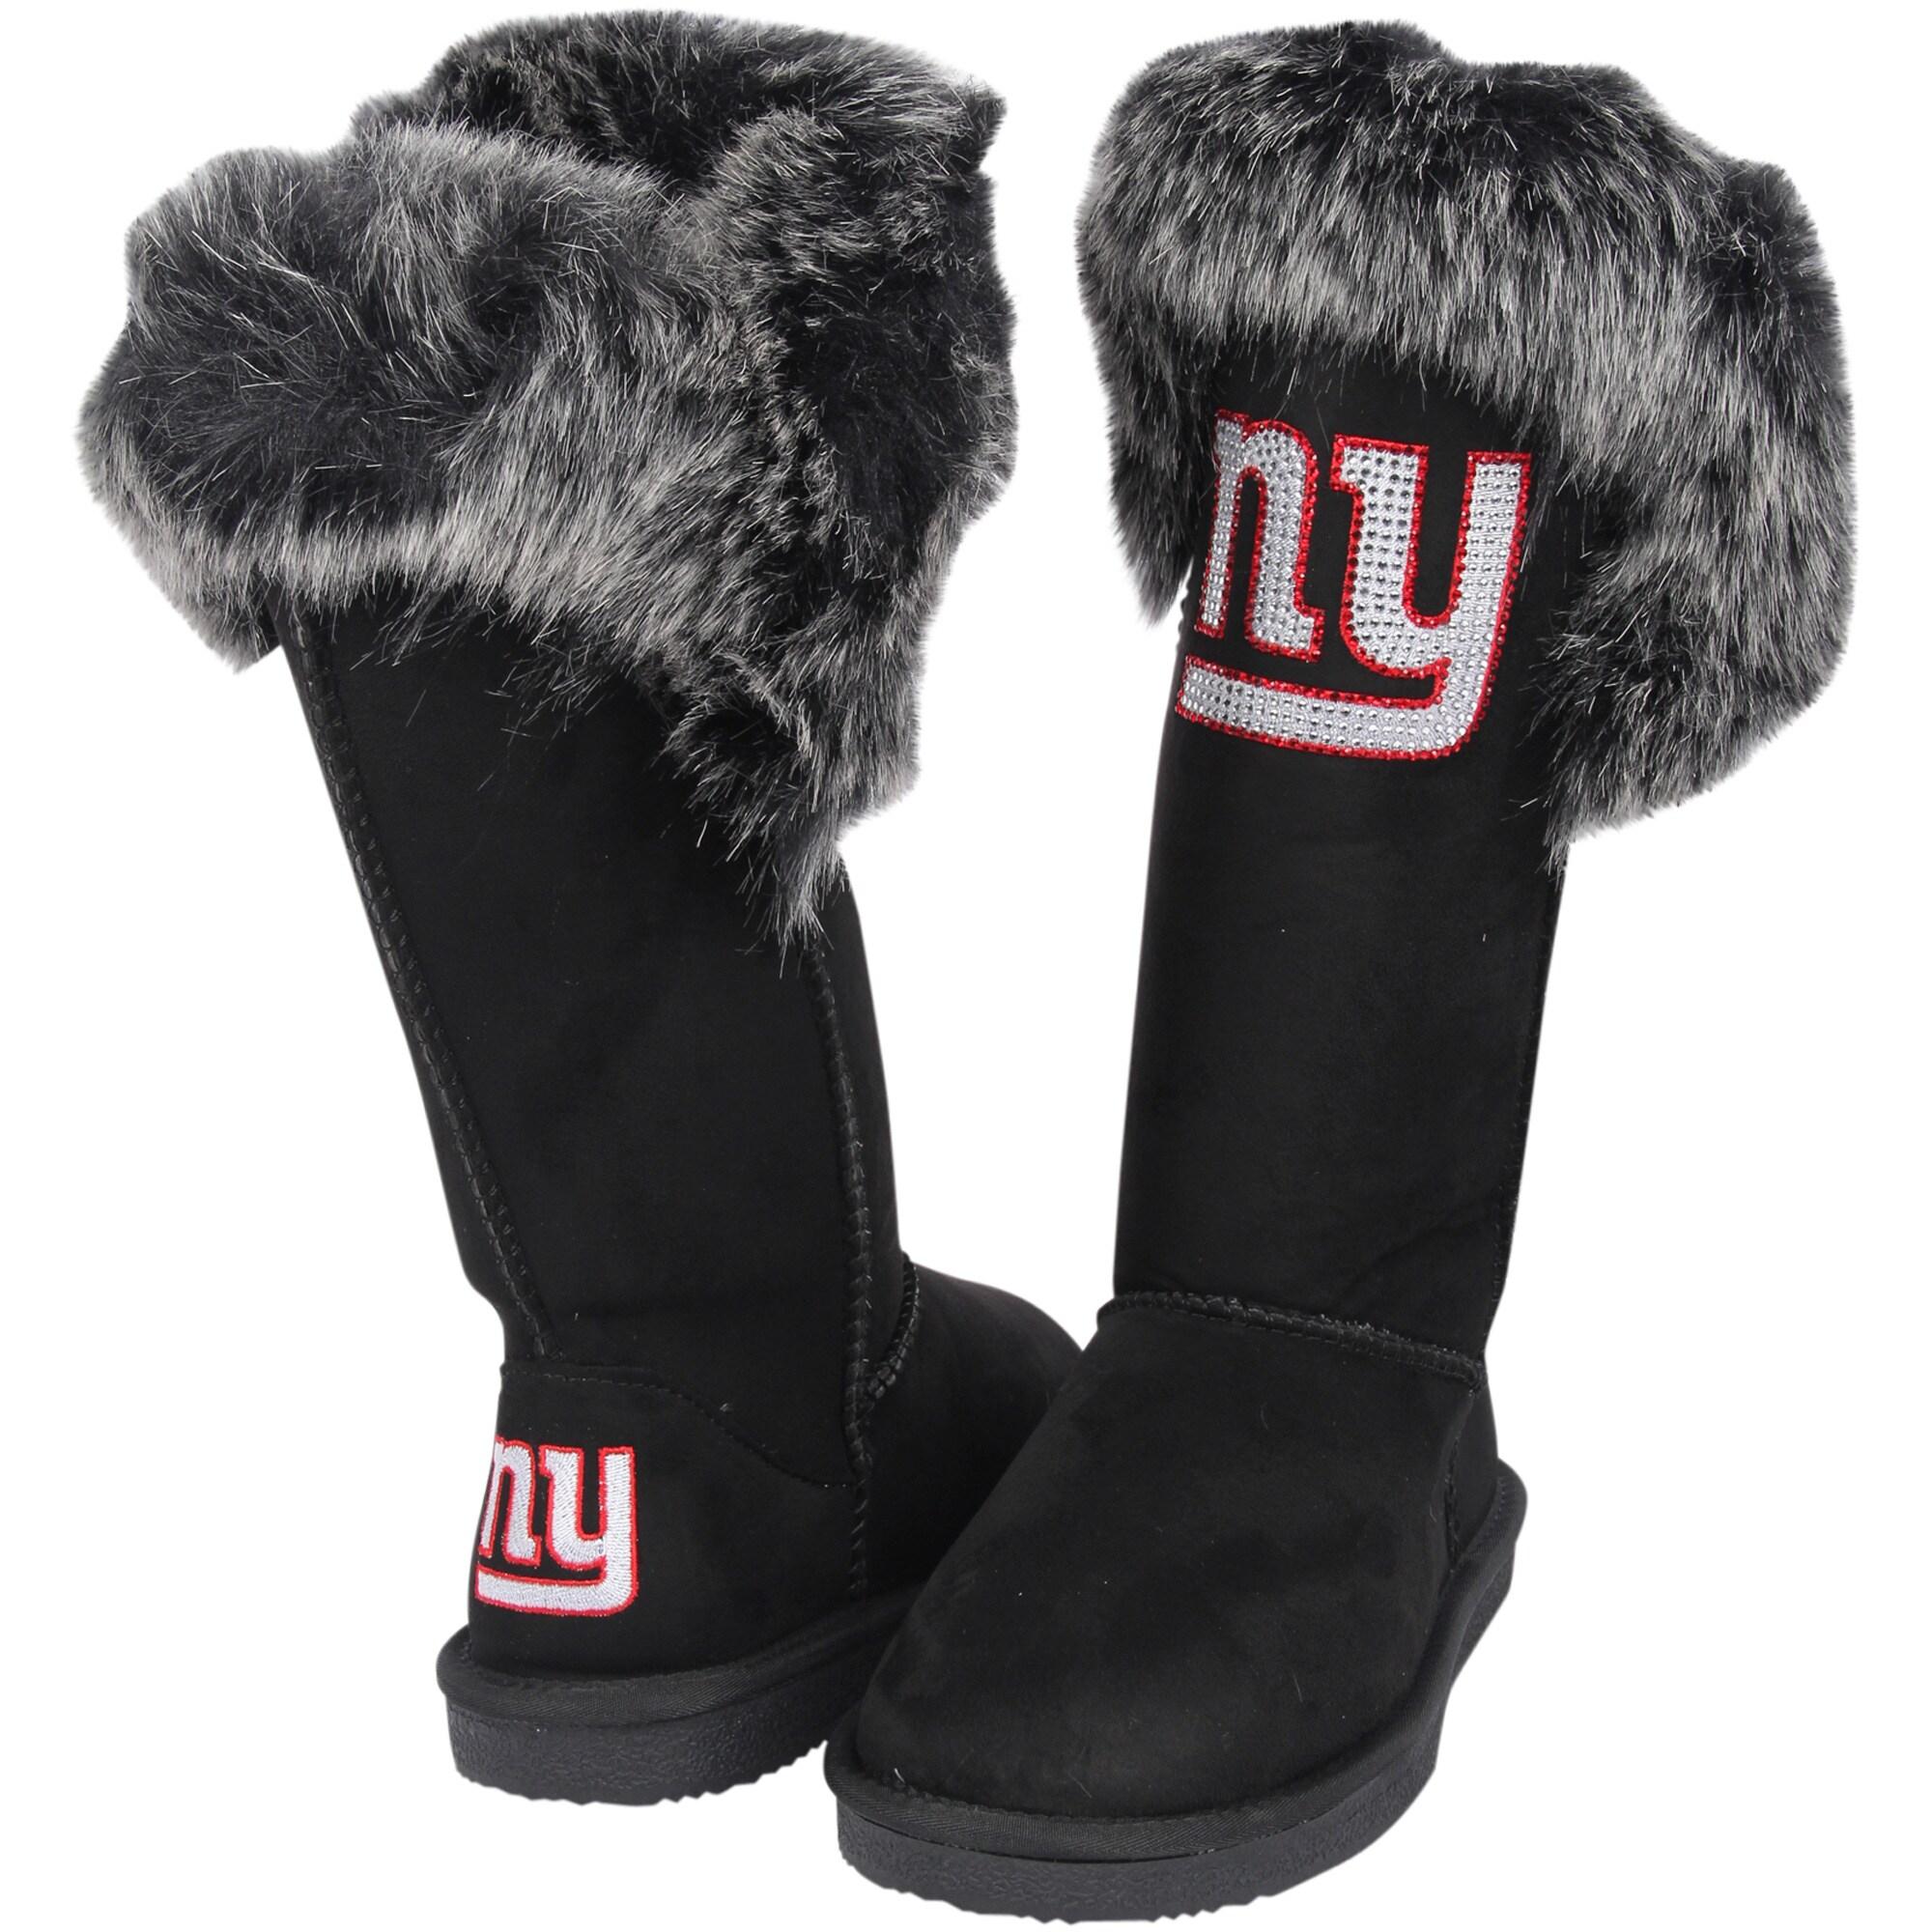 New York Giants Cuce Women's Devoted Boots - Black